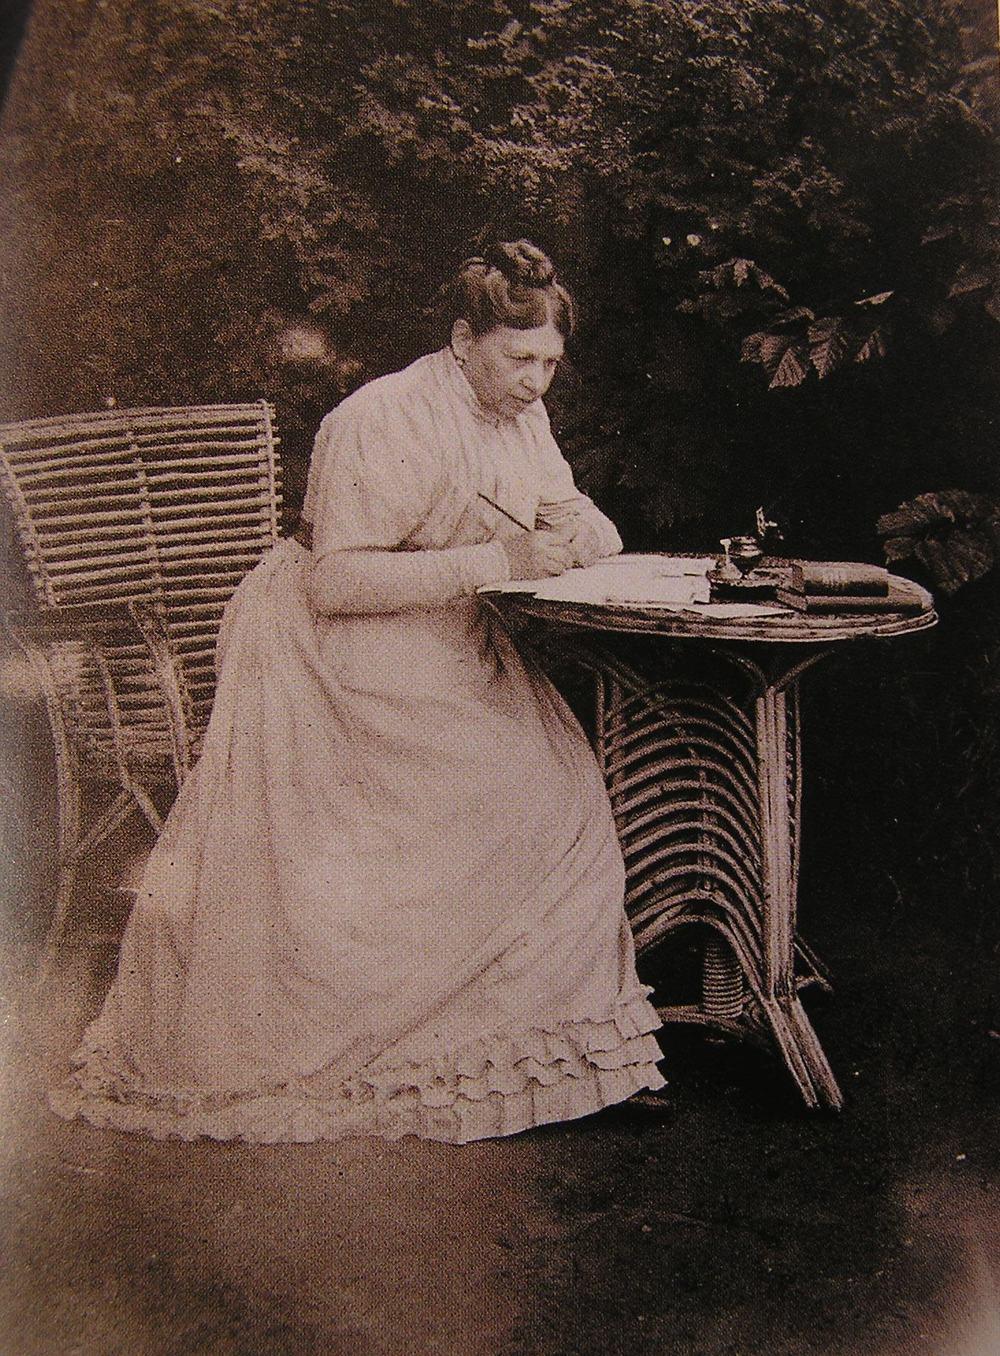 Sophia Tolstaya, circa 1900 (via Wikimedia Commons)